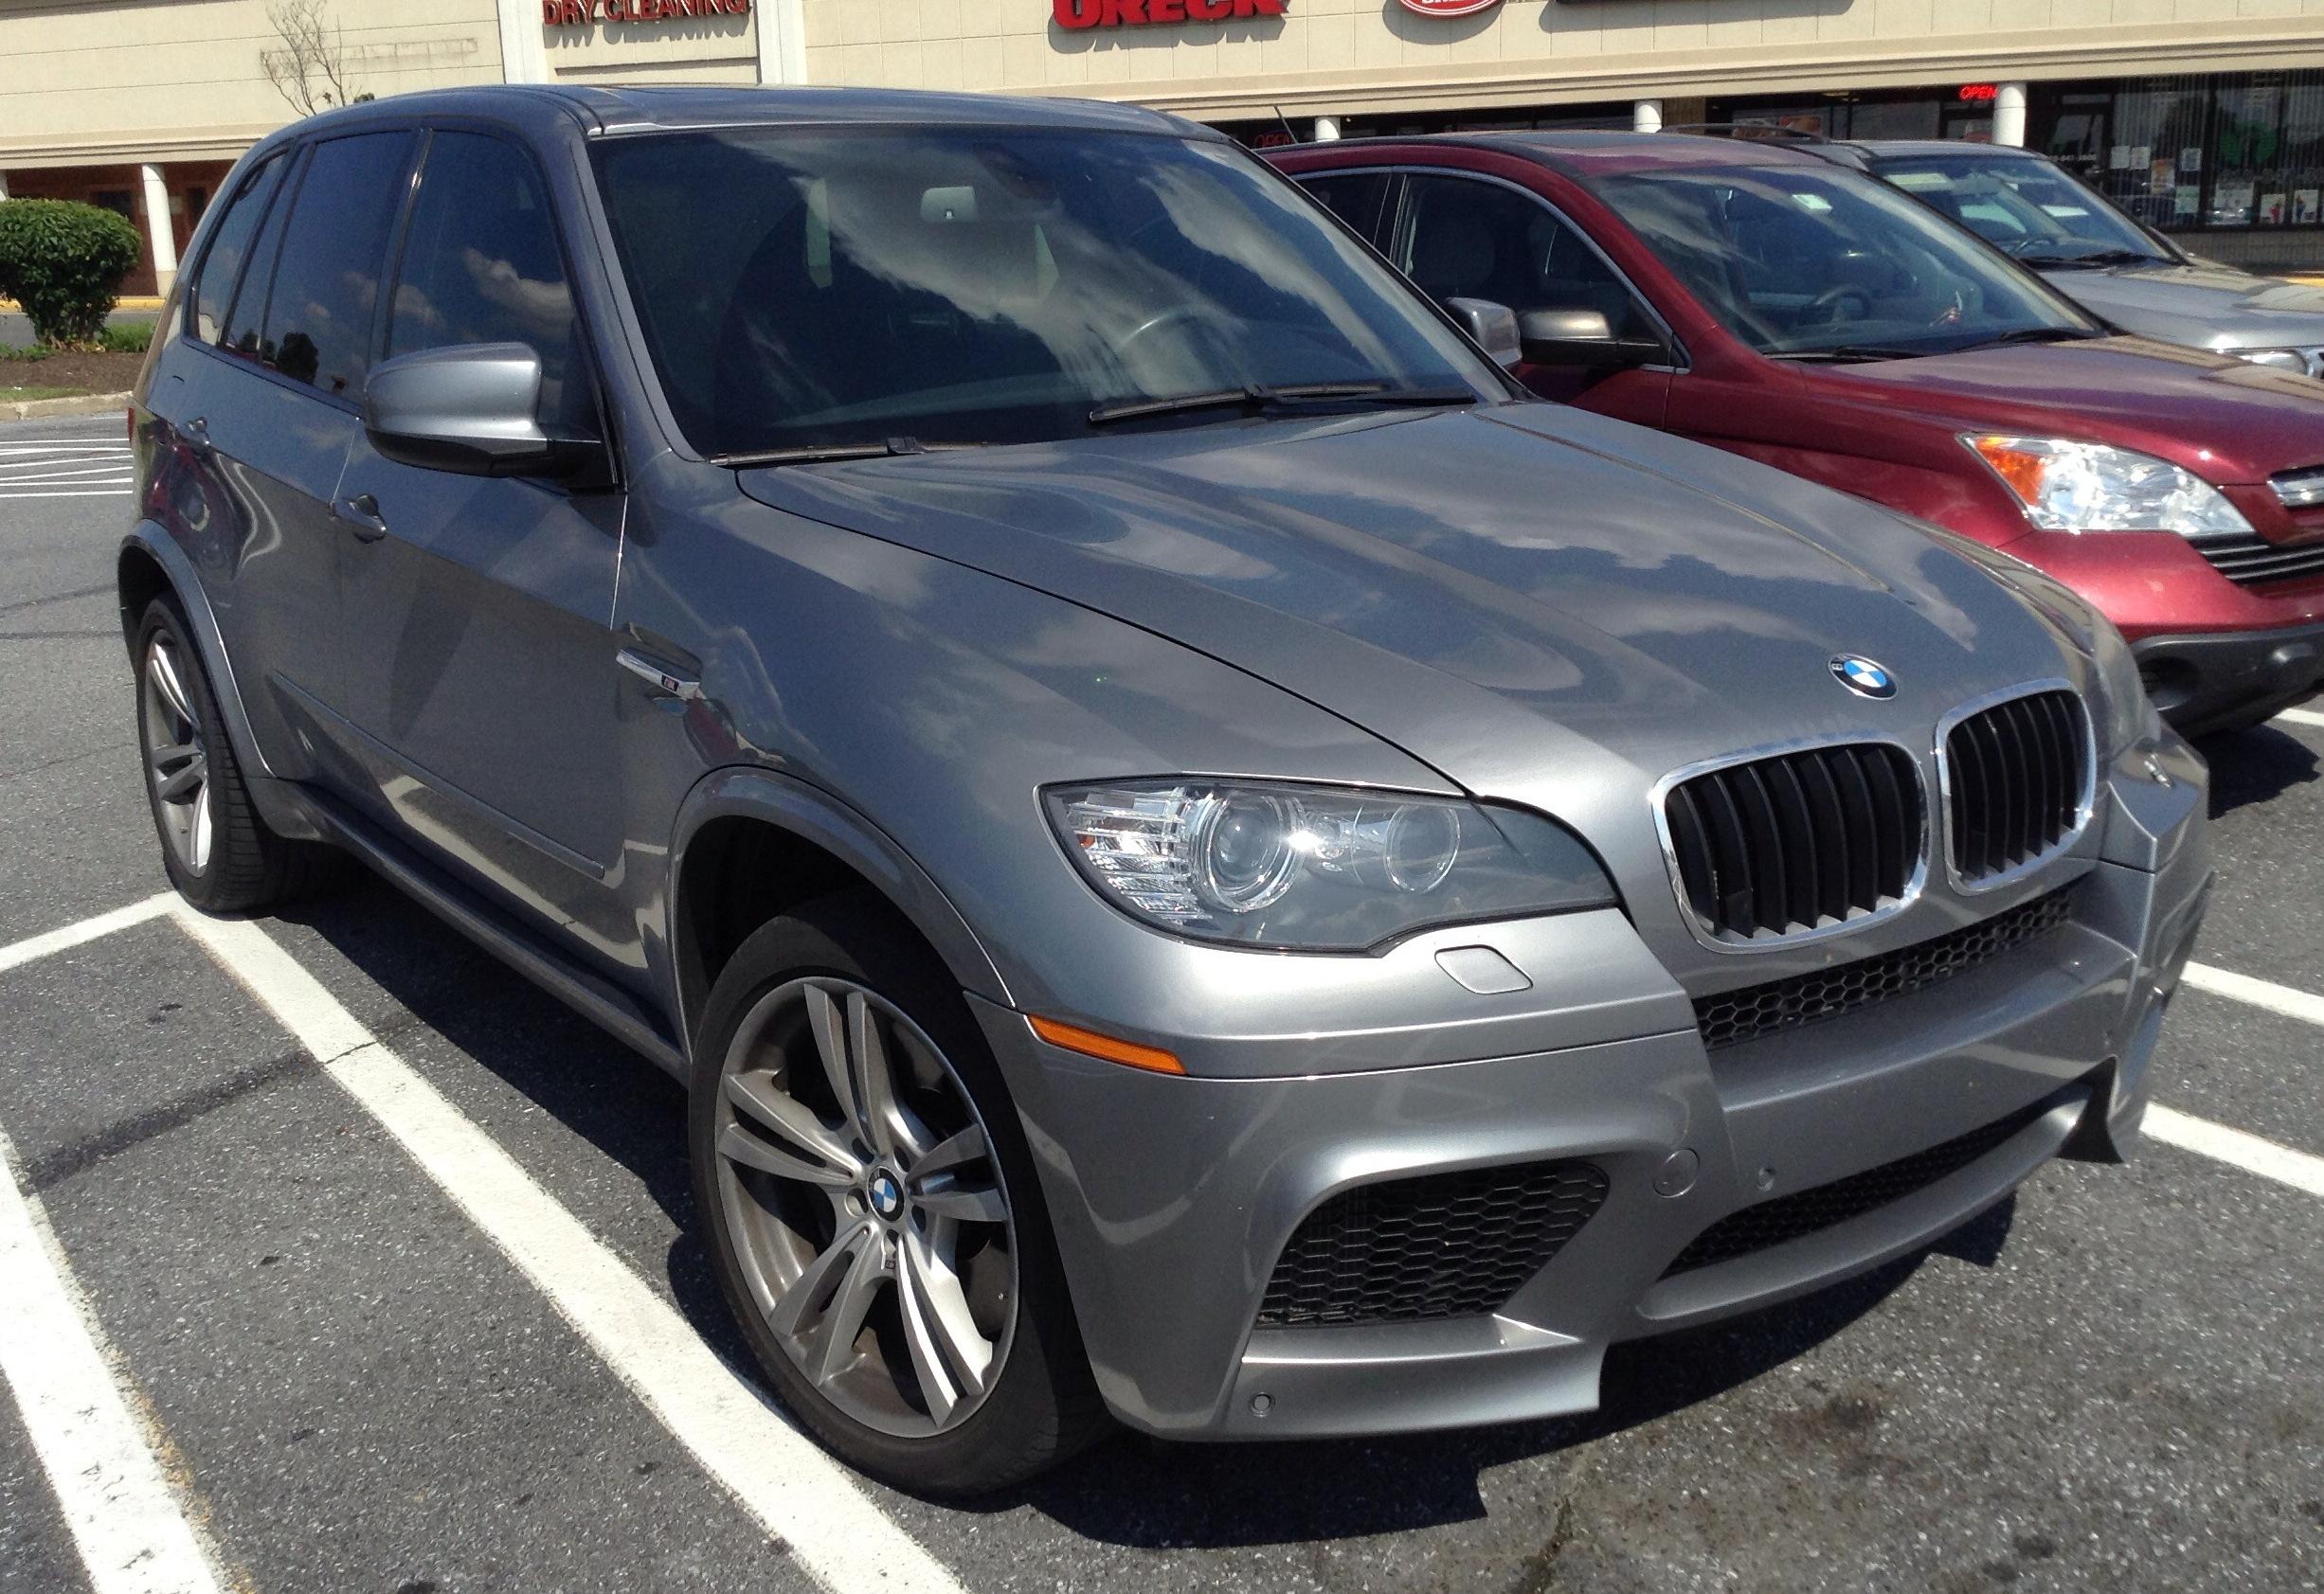 BMW X5 (E70) - Wikiwand